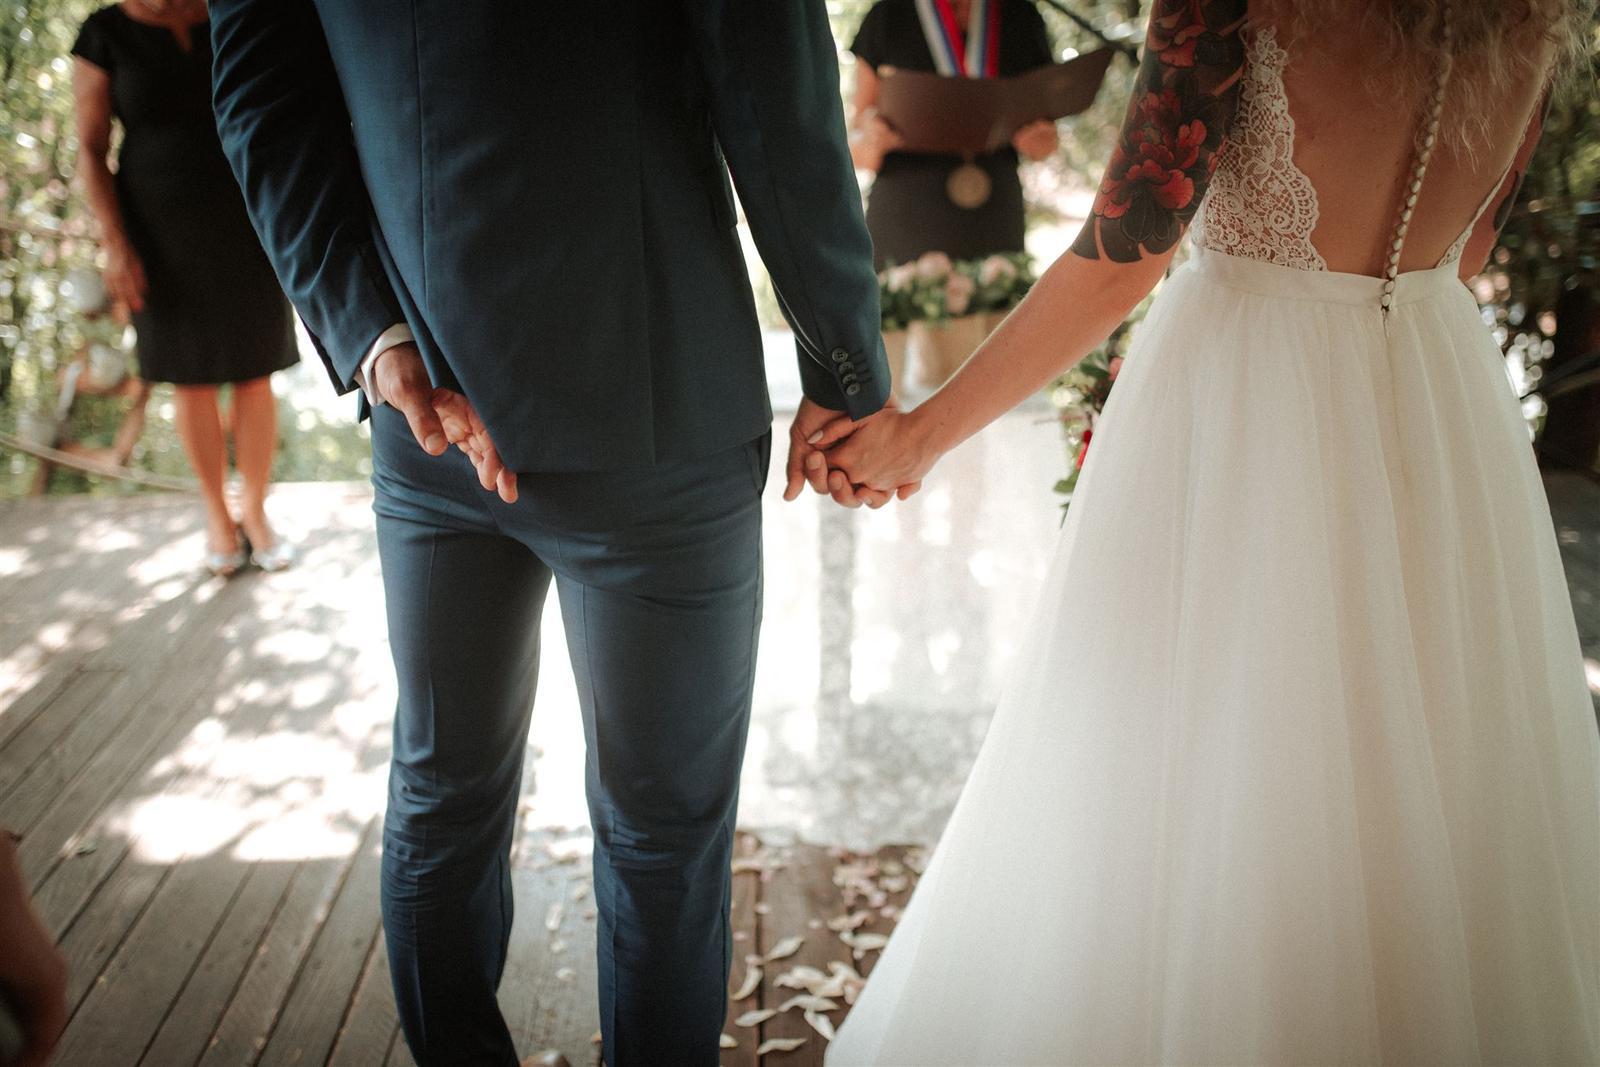 Krásna a romantická svadobná party v záhrade reštaurácie Bistra Dukát - Le Gout v srdci B. Bystrice. - Obrázok č. 14